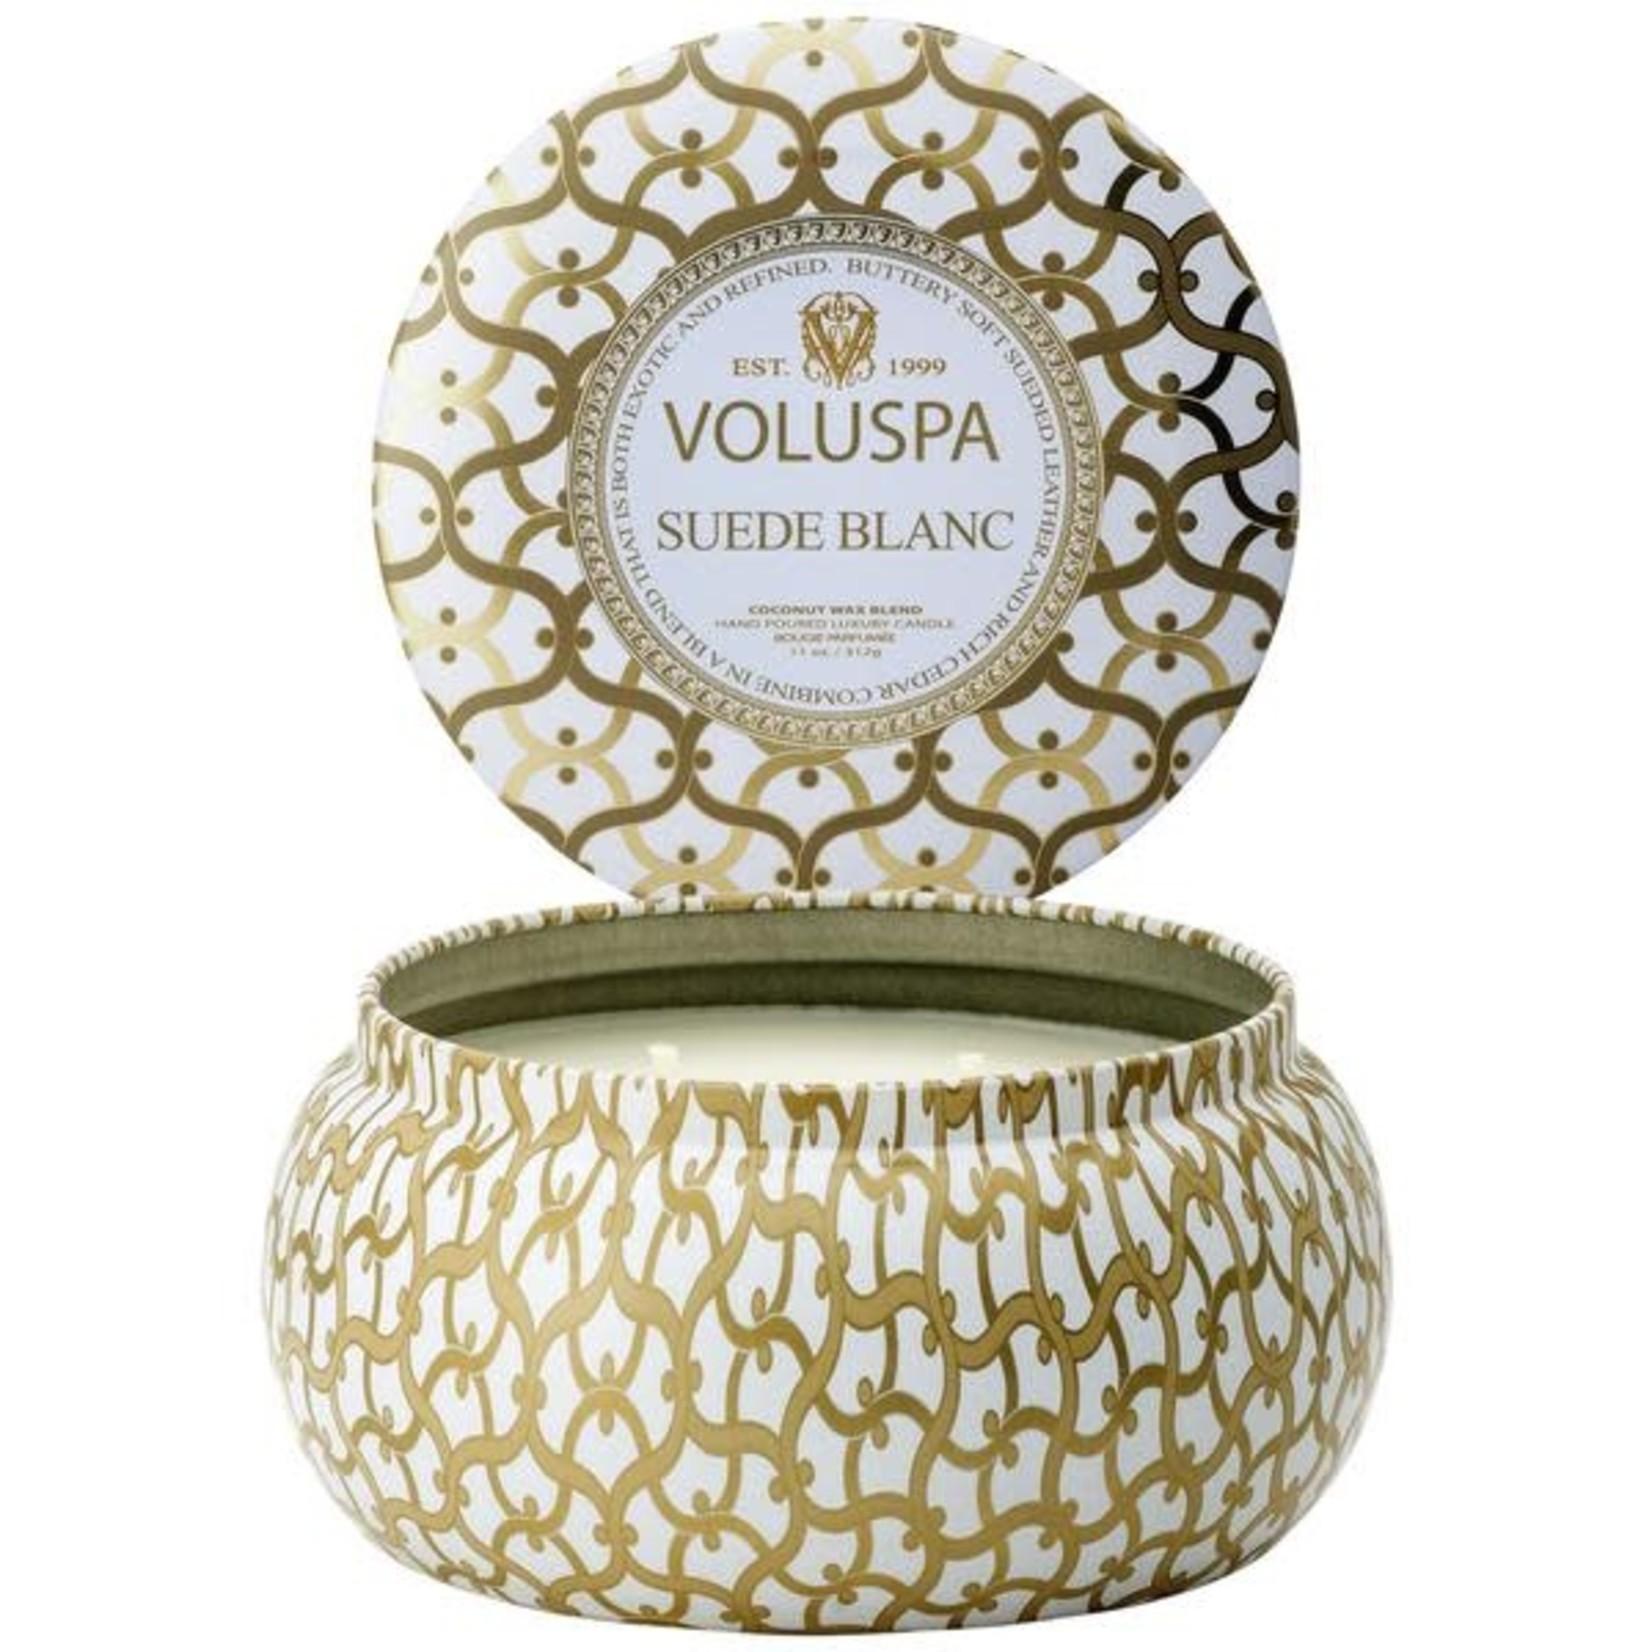 Voluspa Suede Blanc 2 wick Metallo Candle in Printed tin